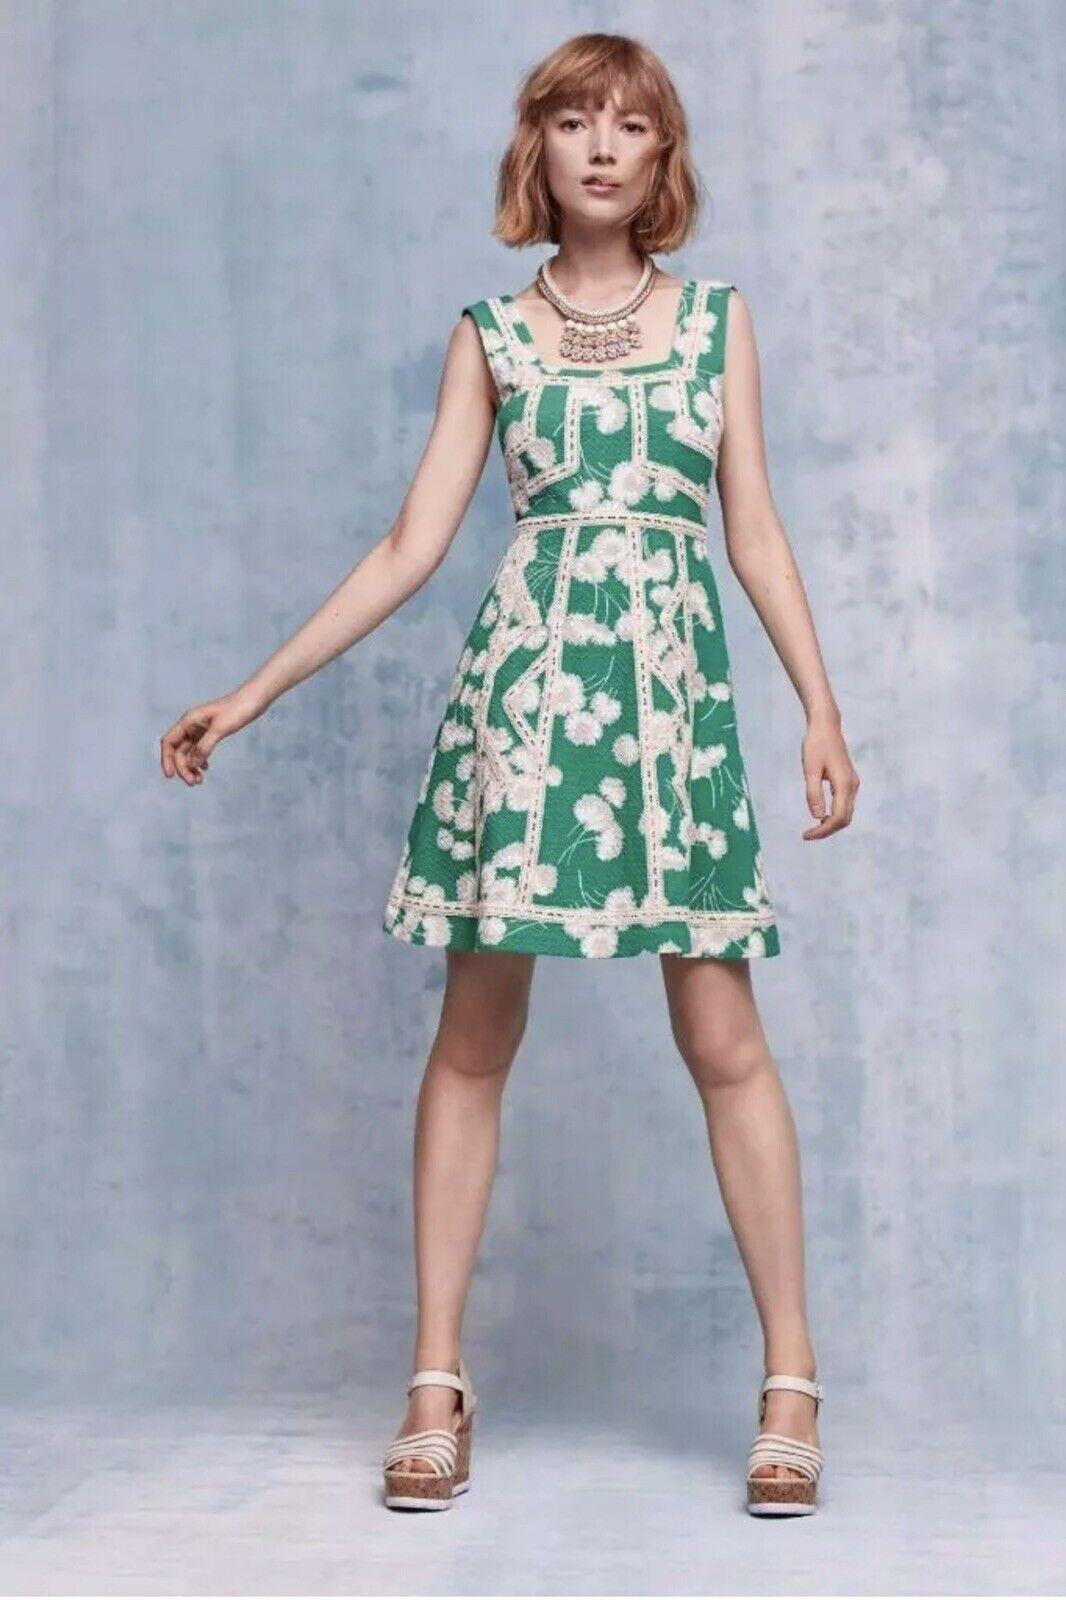 NEW Anthropologie Emma Dress By Maeve Grün Floral Fit + Flare Größe Sz 10